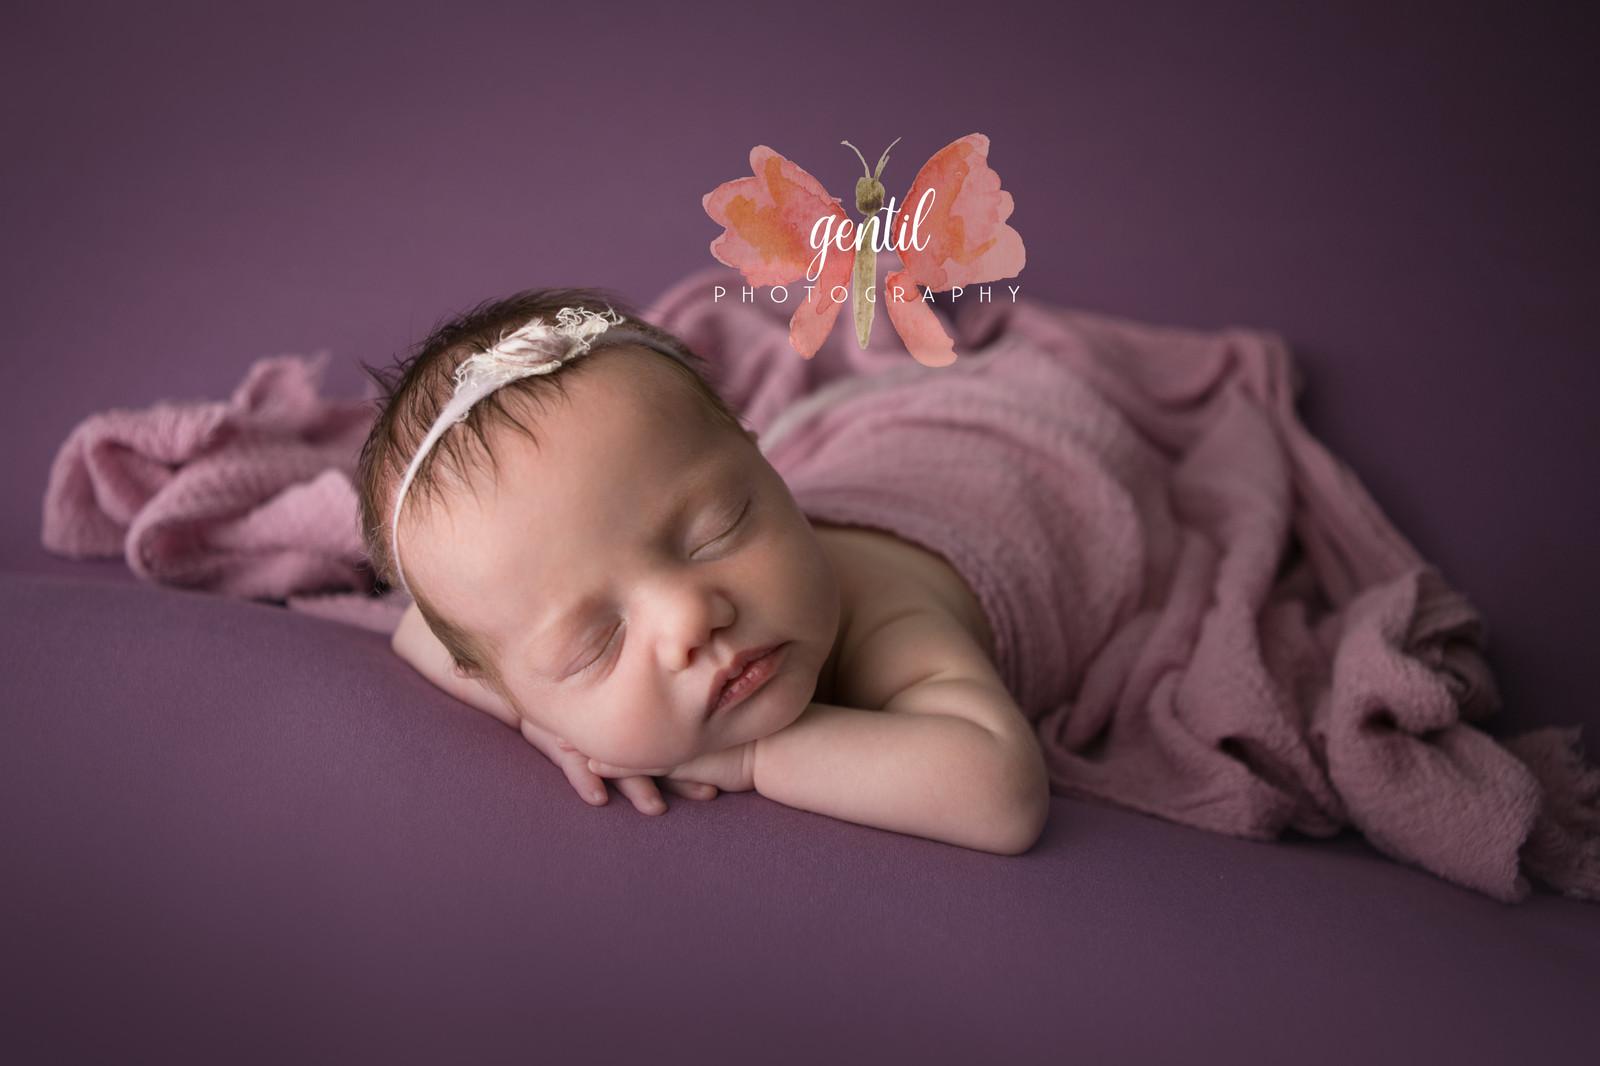 ce4c695c8 Gentil Photography - Newborn